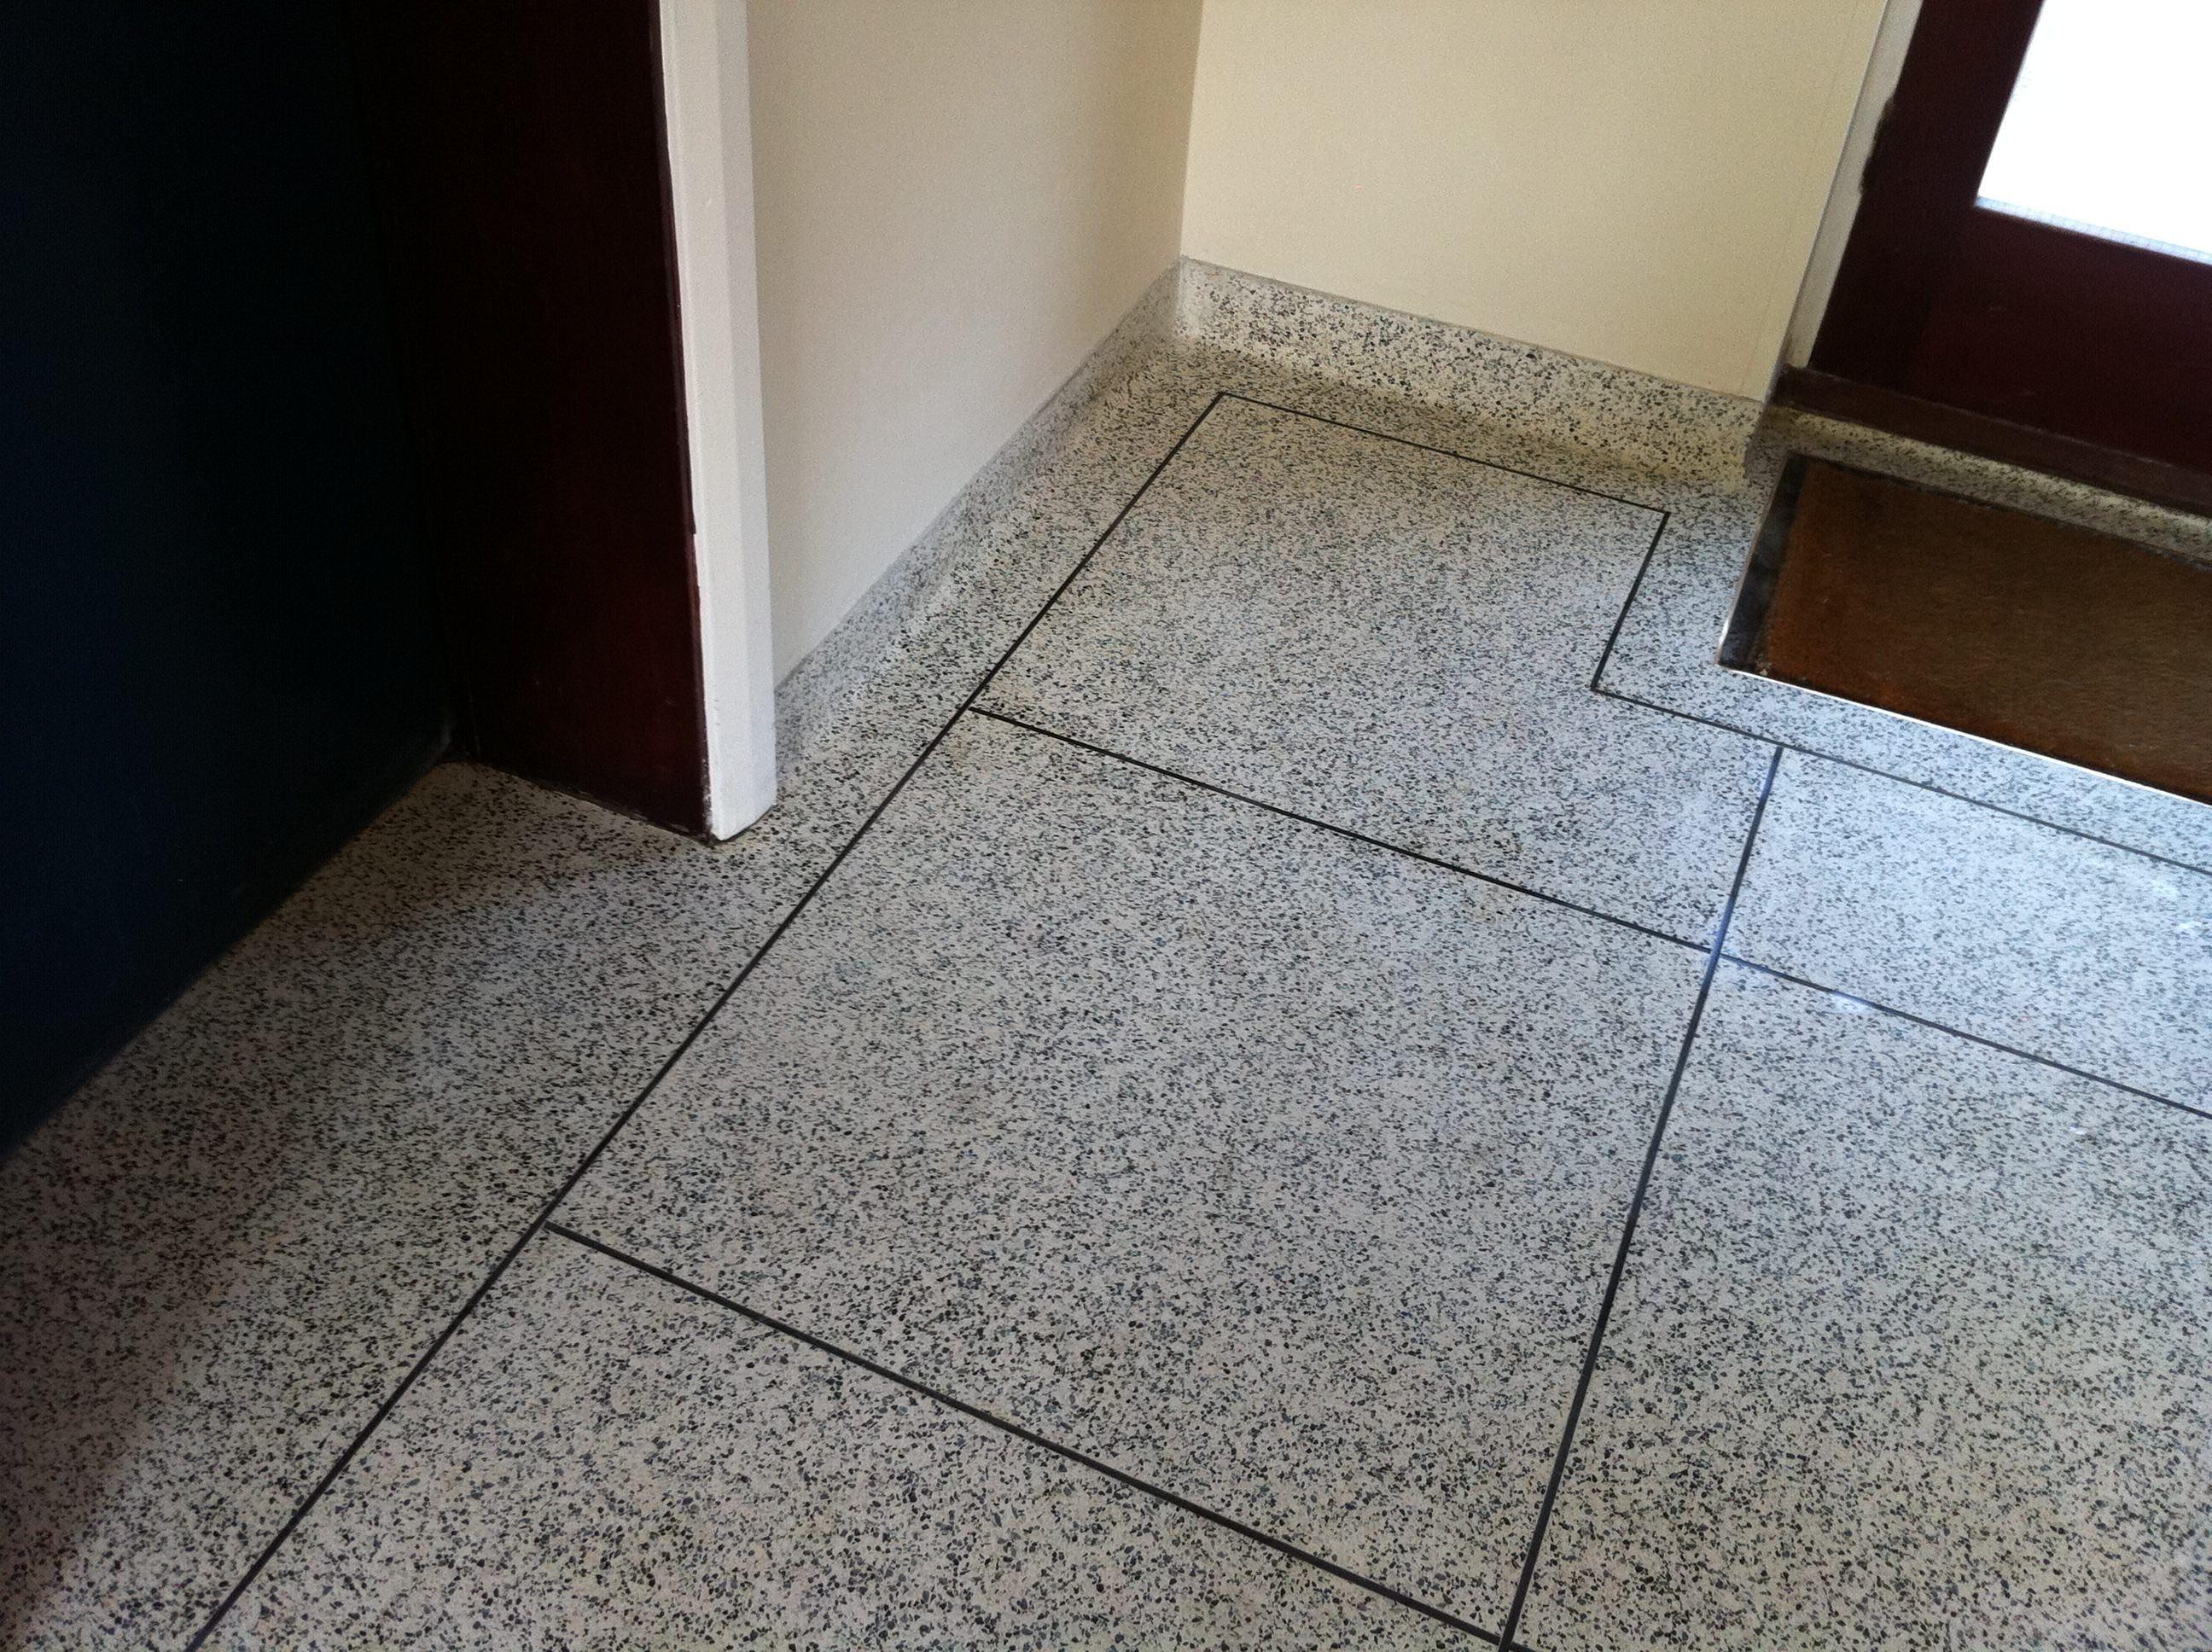 Terrazzo Floor Stair Cleaners Cleaning Terrazzo Flooring